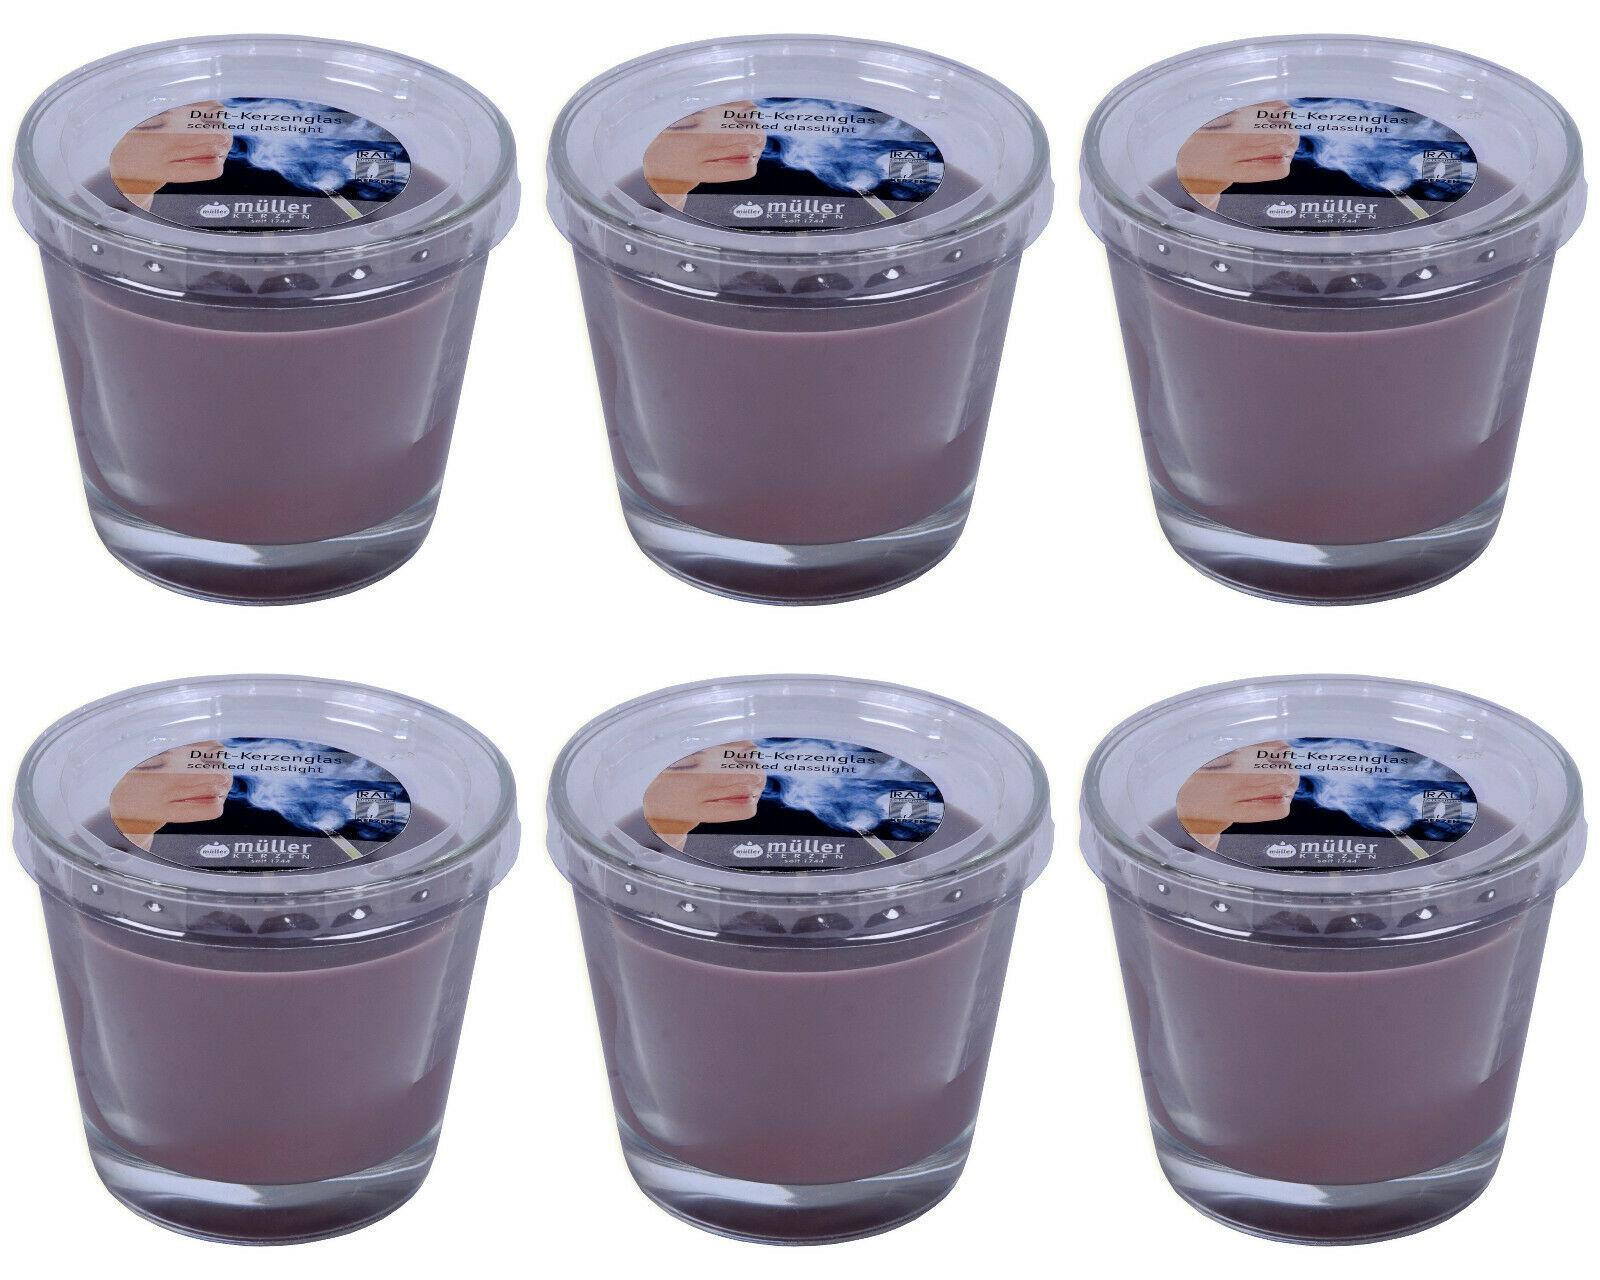 6 Müller Duftkerzen im Glas 80x90 mm Duftgläser 430g Kerzenglas Anti Tabak